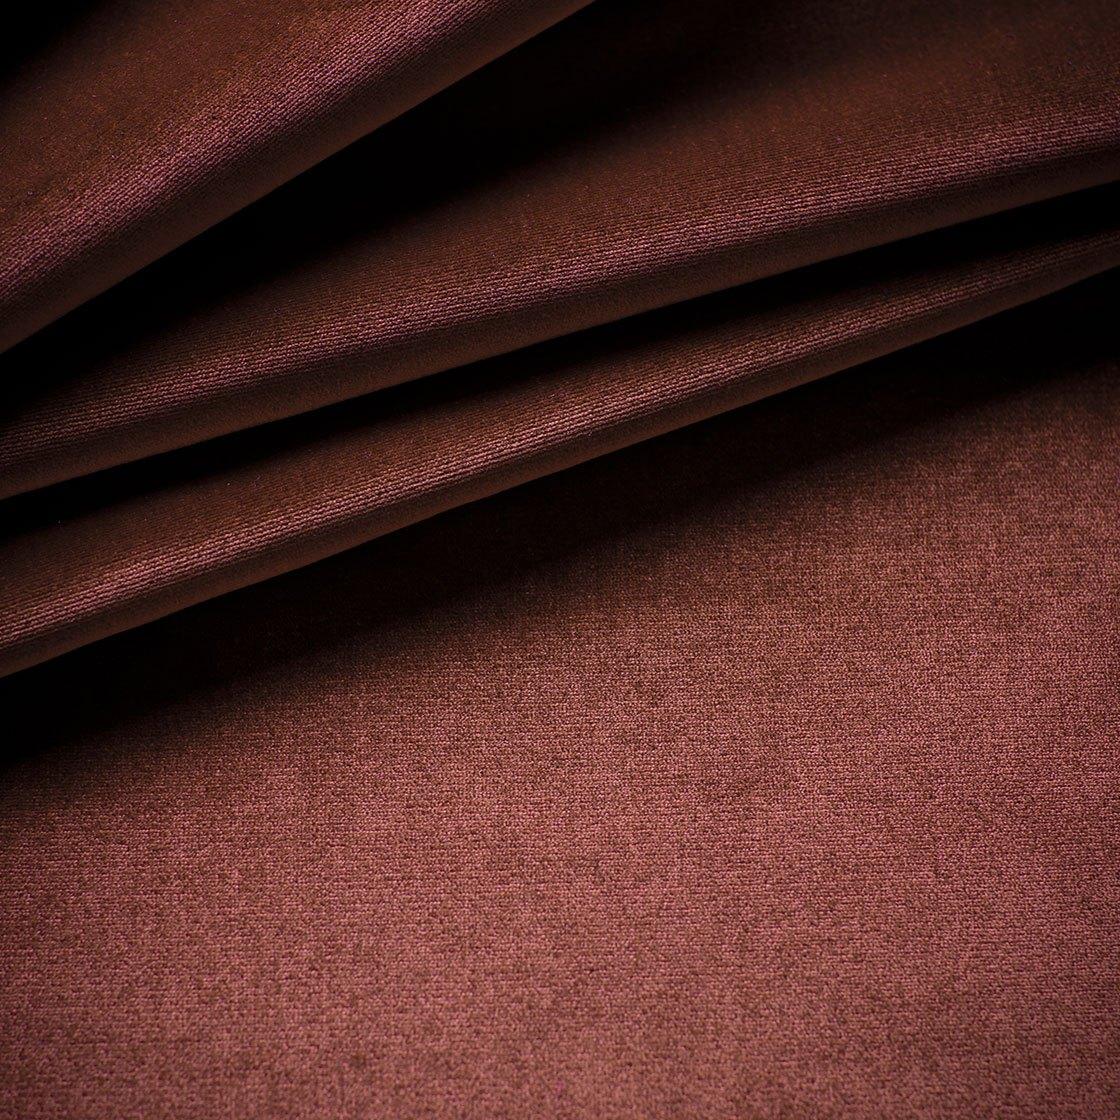 Capri Silk Velvet - Russet - Beaumont & Fletcher - Beaumont & Fletcher